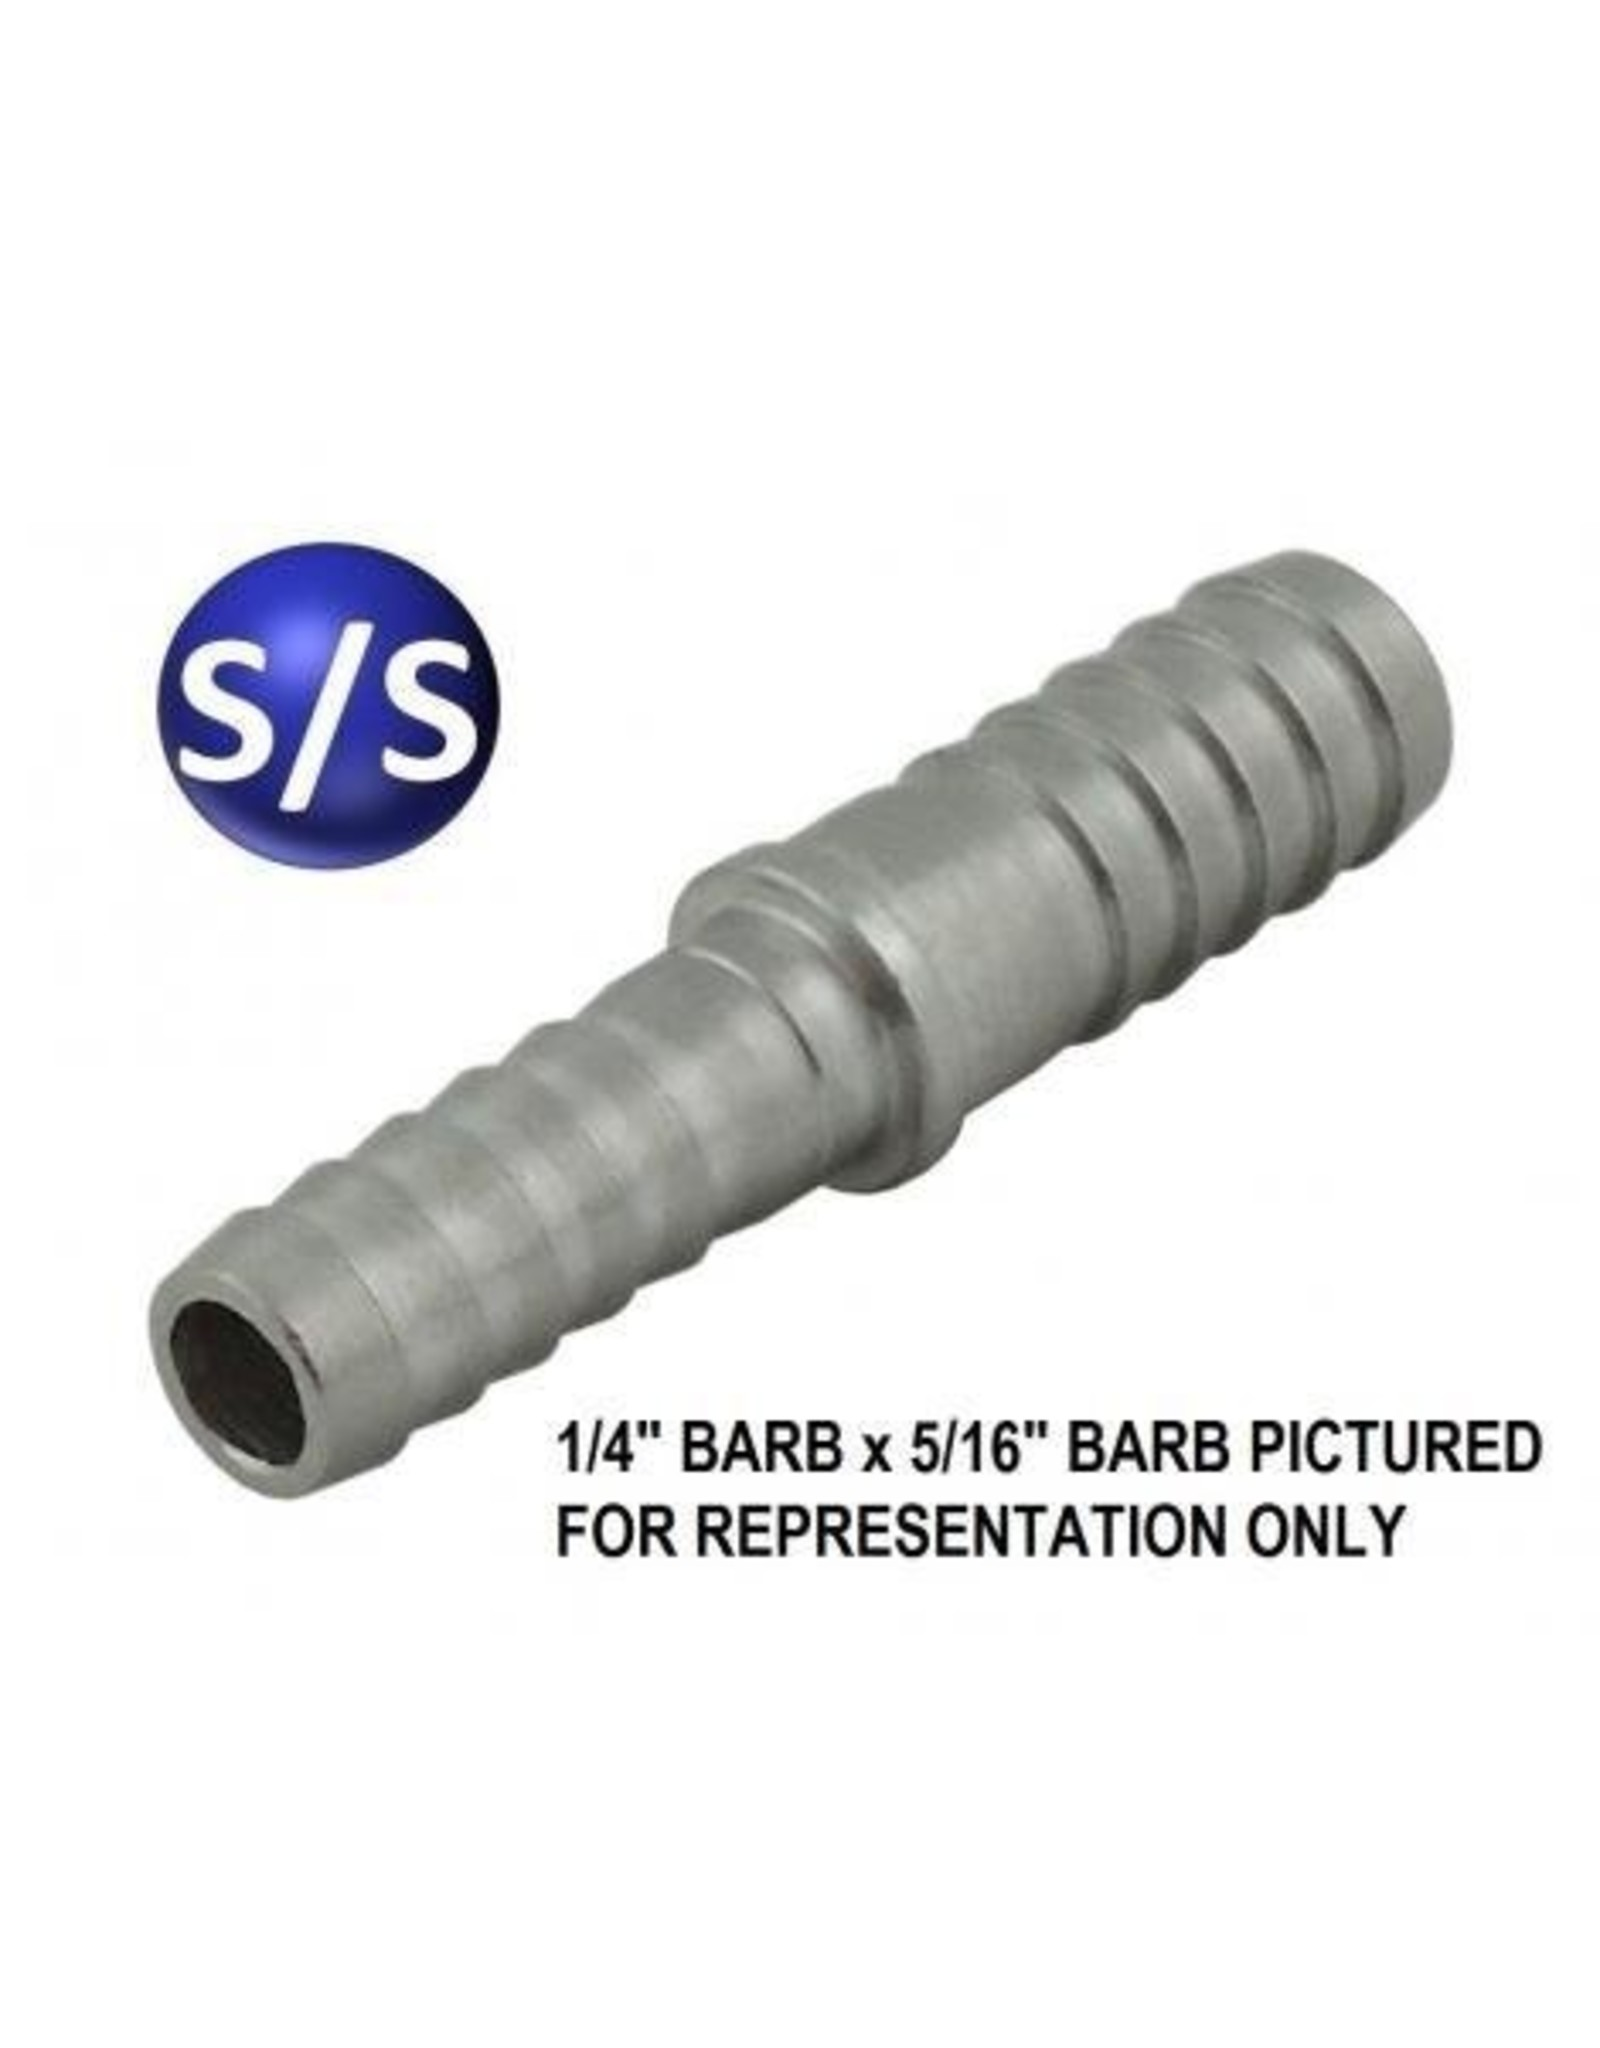 Hose Barb Splicer SS 5/16B X 1/4B